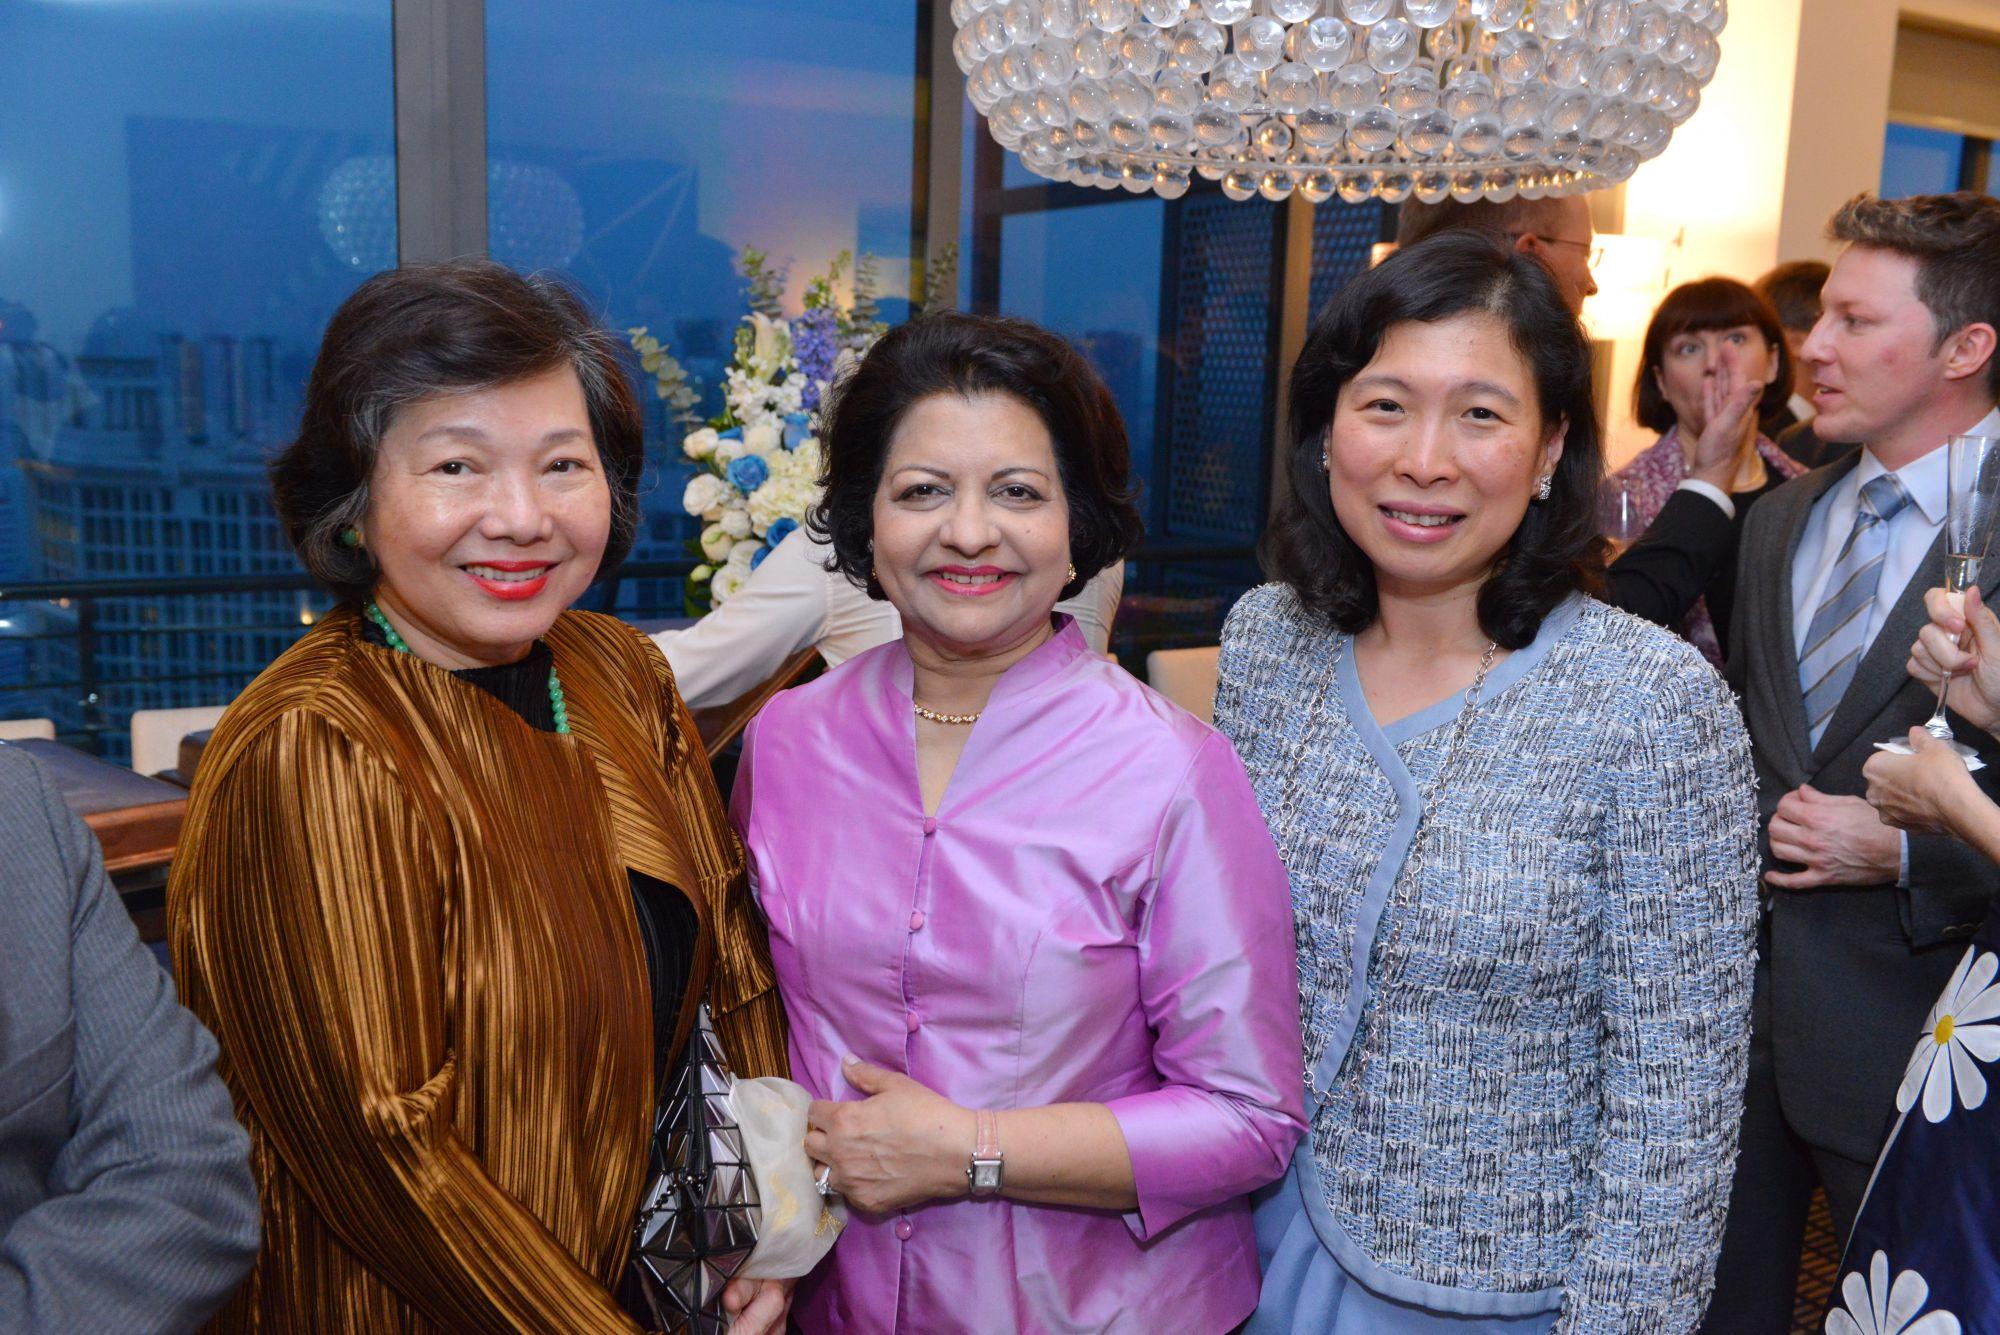 Yu-Foo Yee Shoon, Jaya Mohideen, Michelle Liem